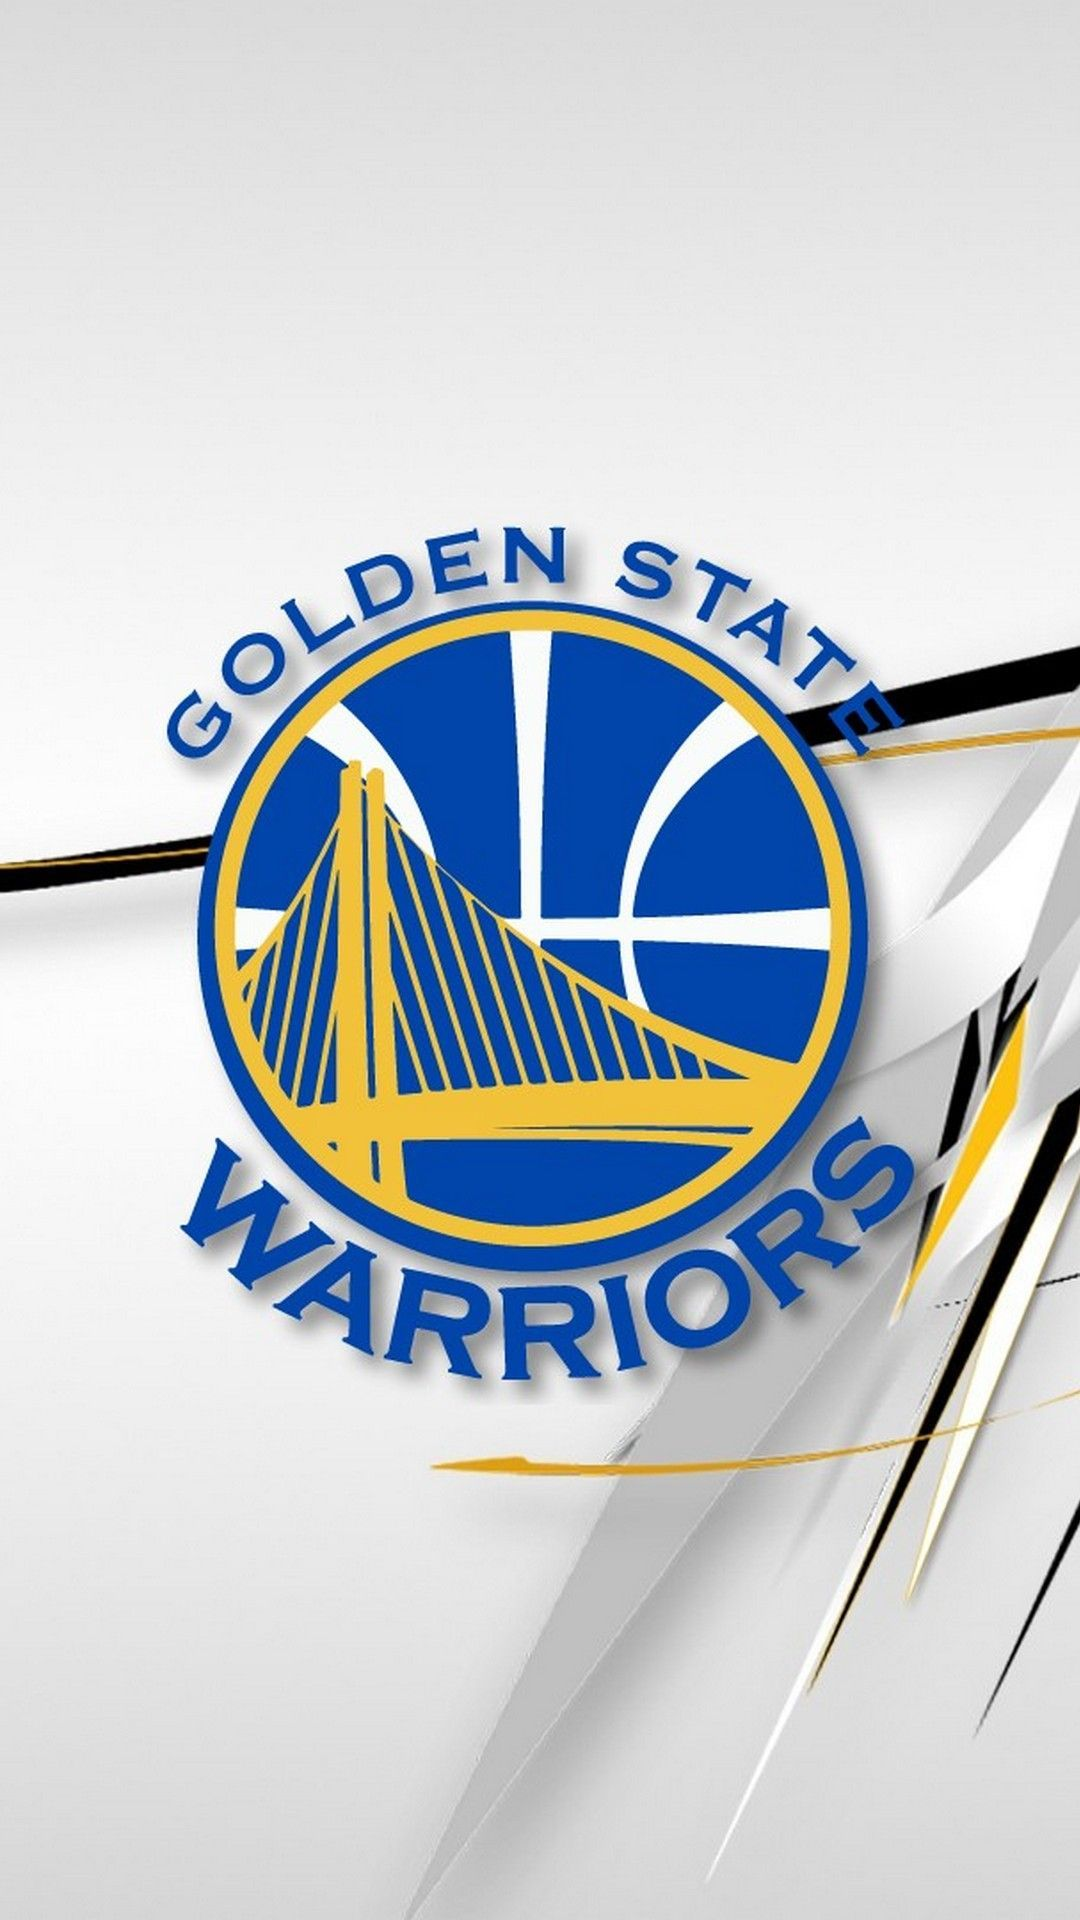 Golden State Warriors Wallpapers On Wallpaperdog